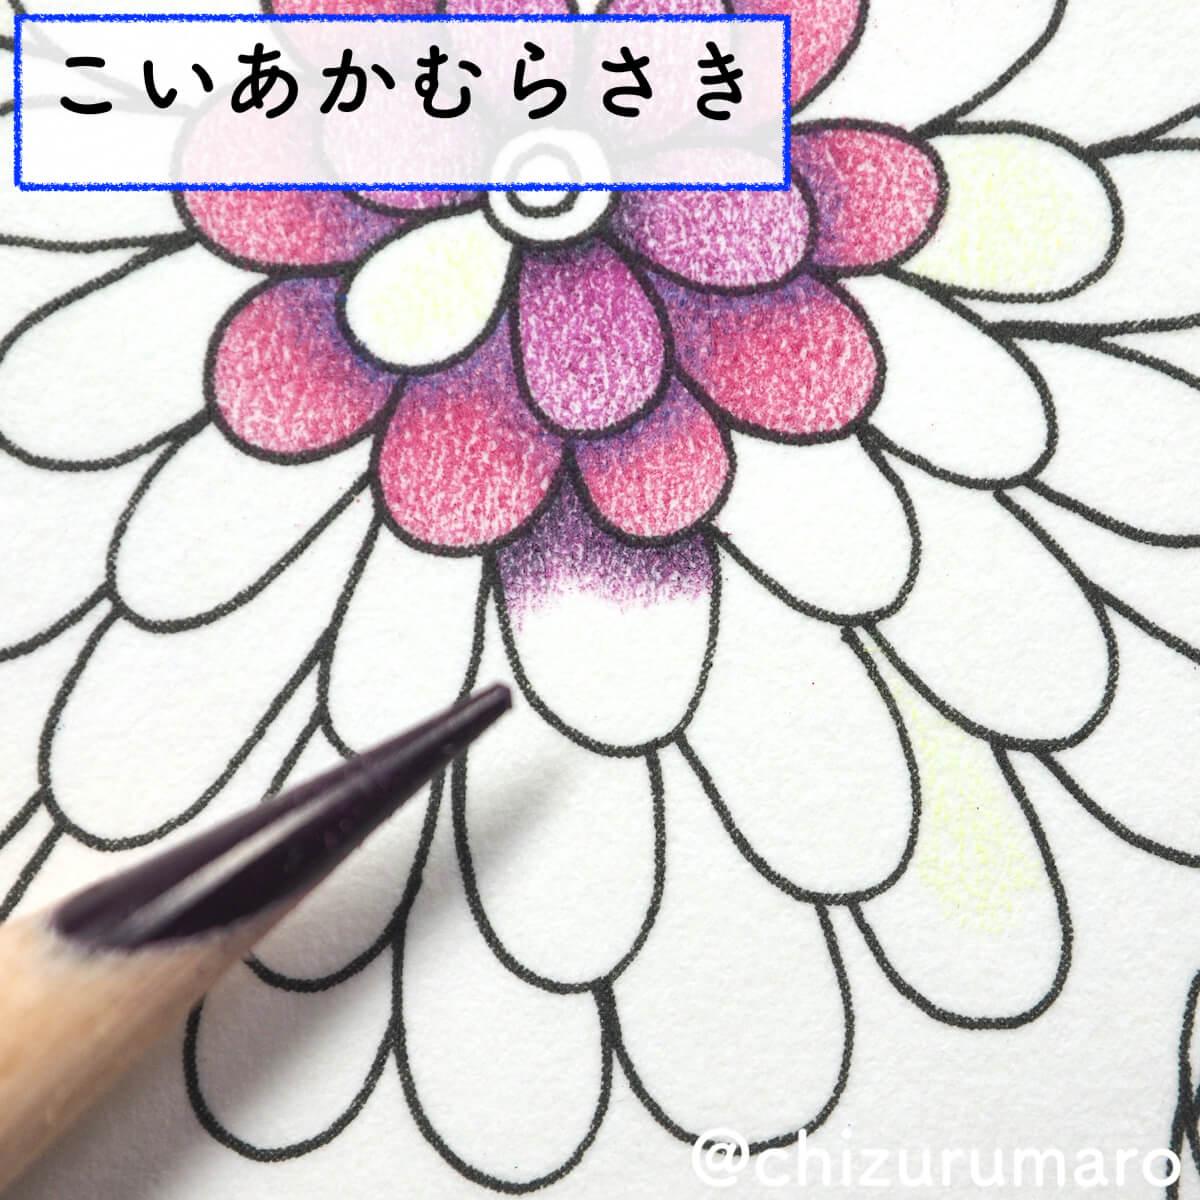 f:id:chizurumaro:20200415163133j:plain